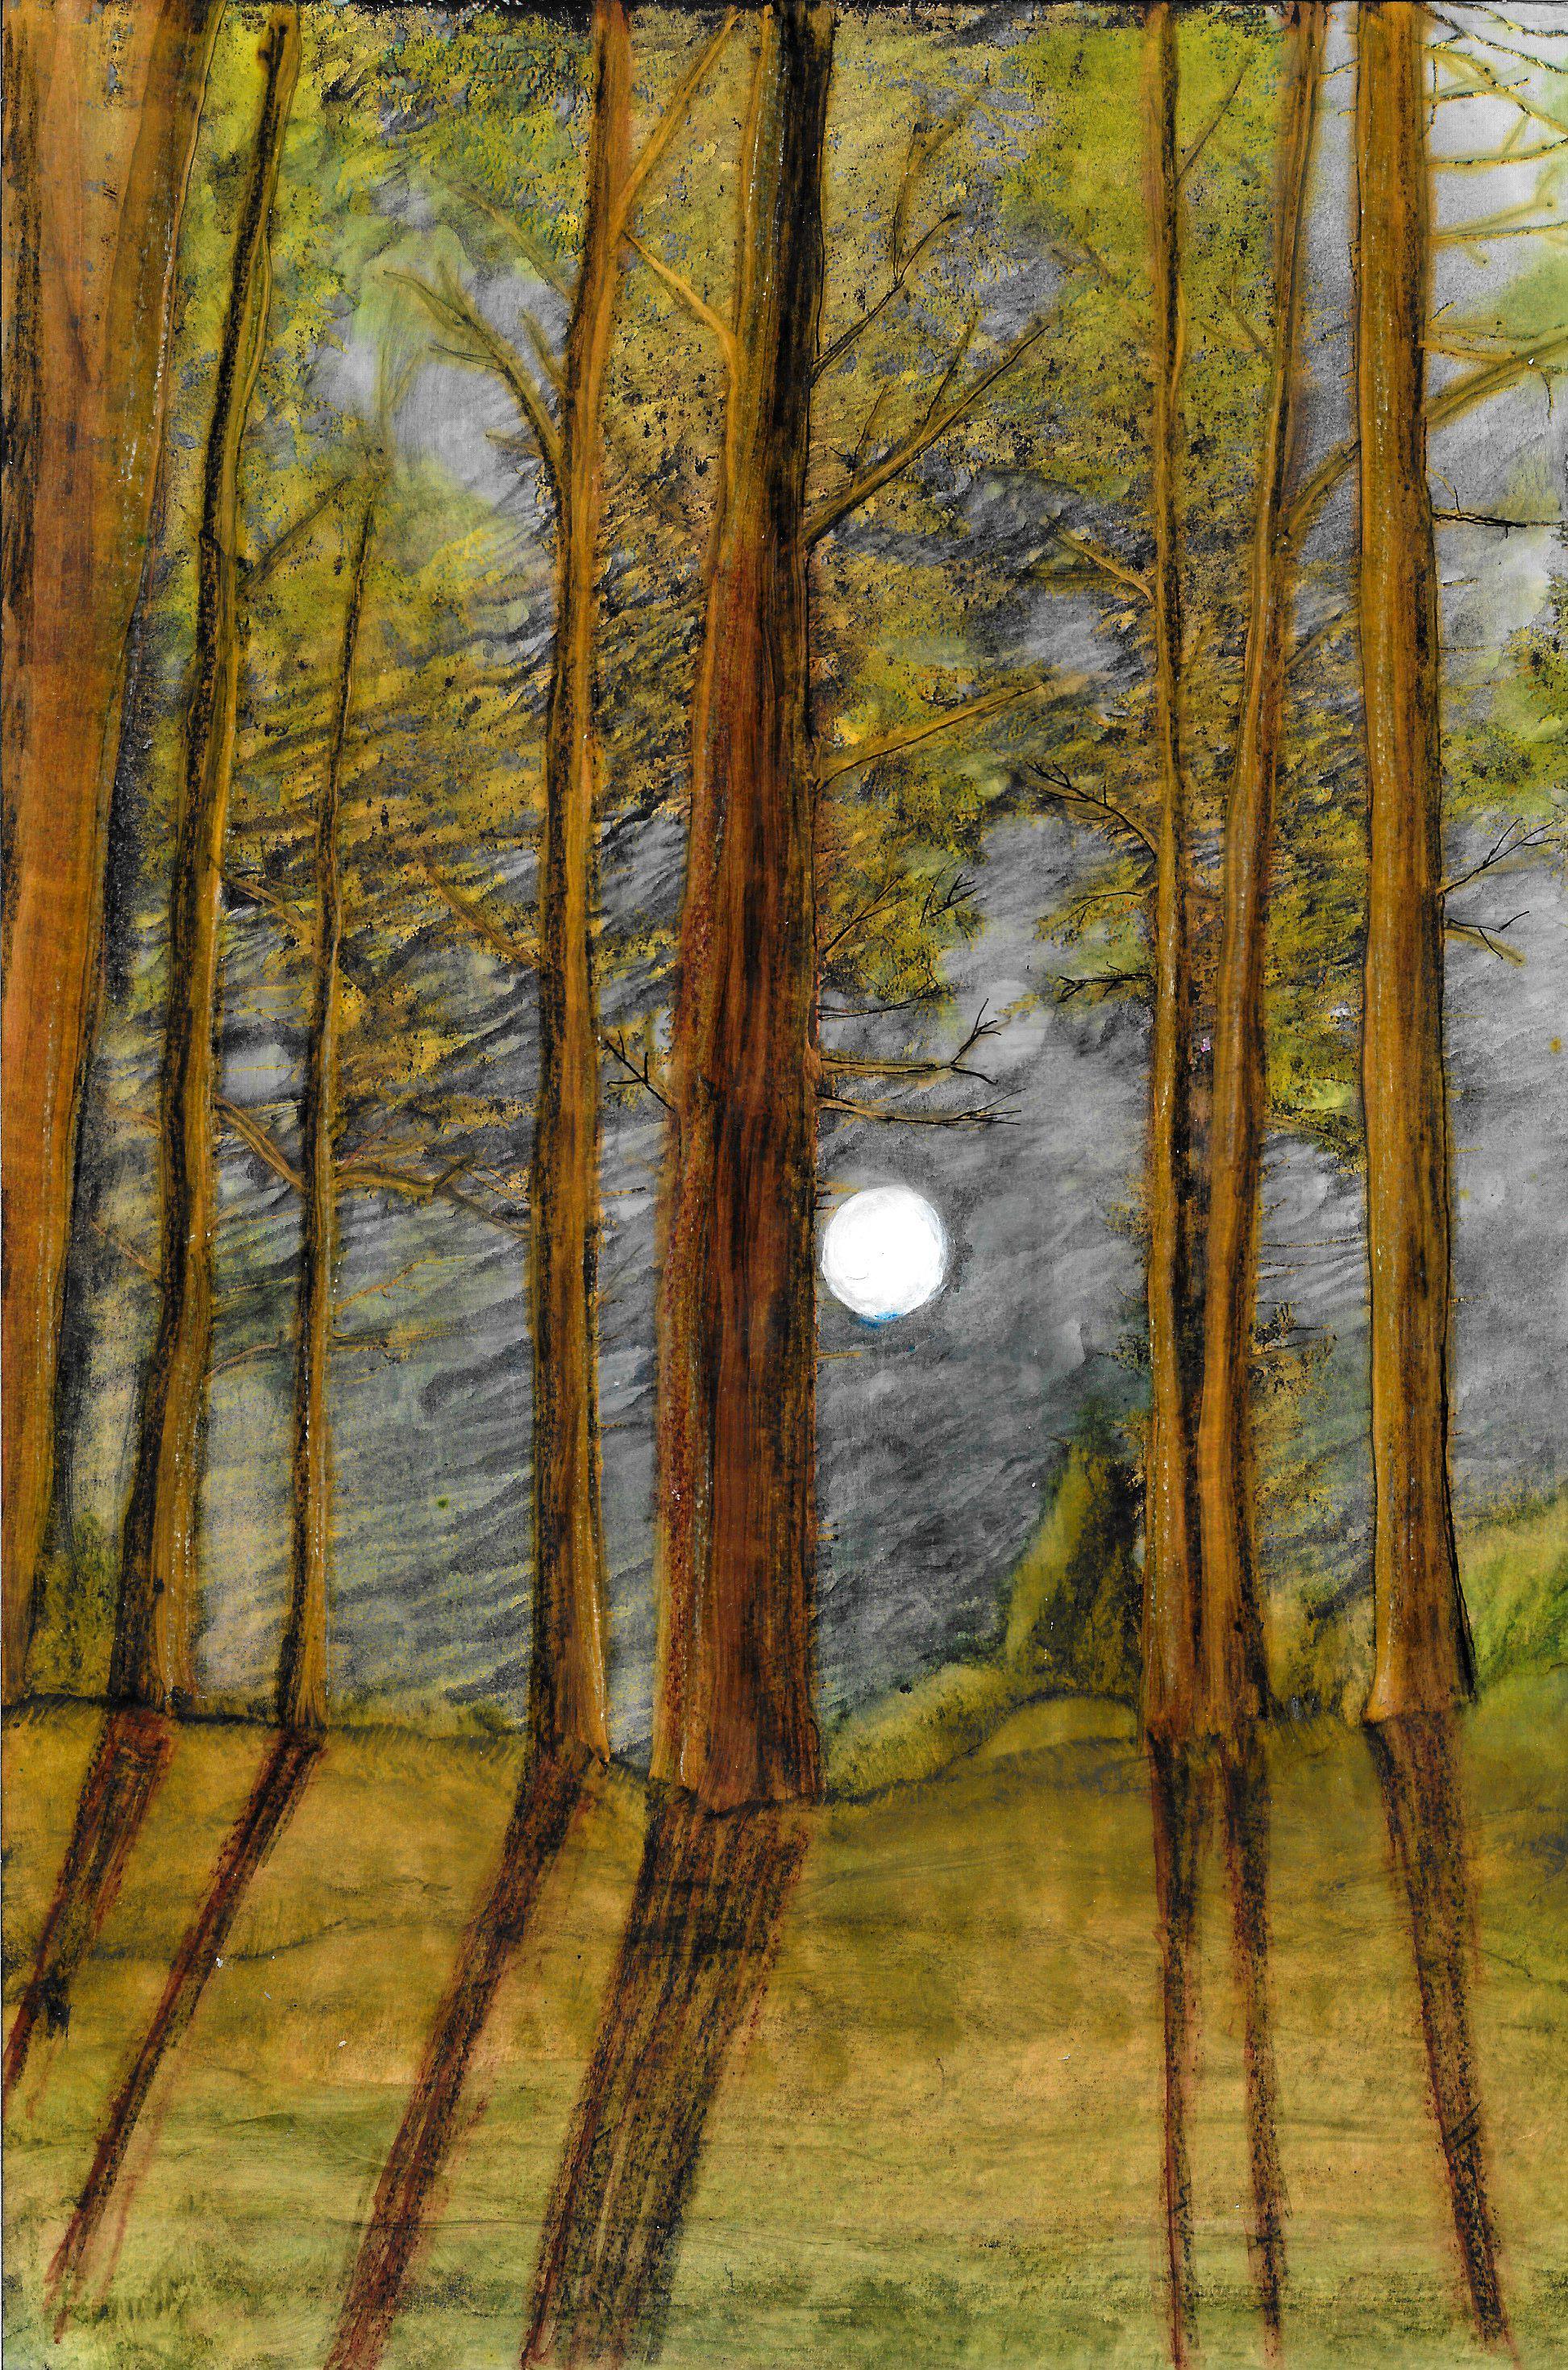 Citrasolv Full Moon in Forest